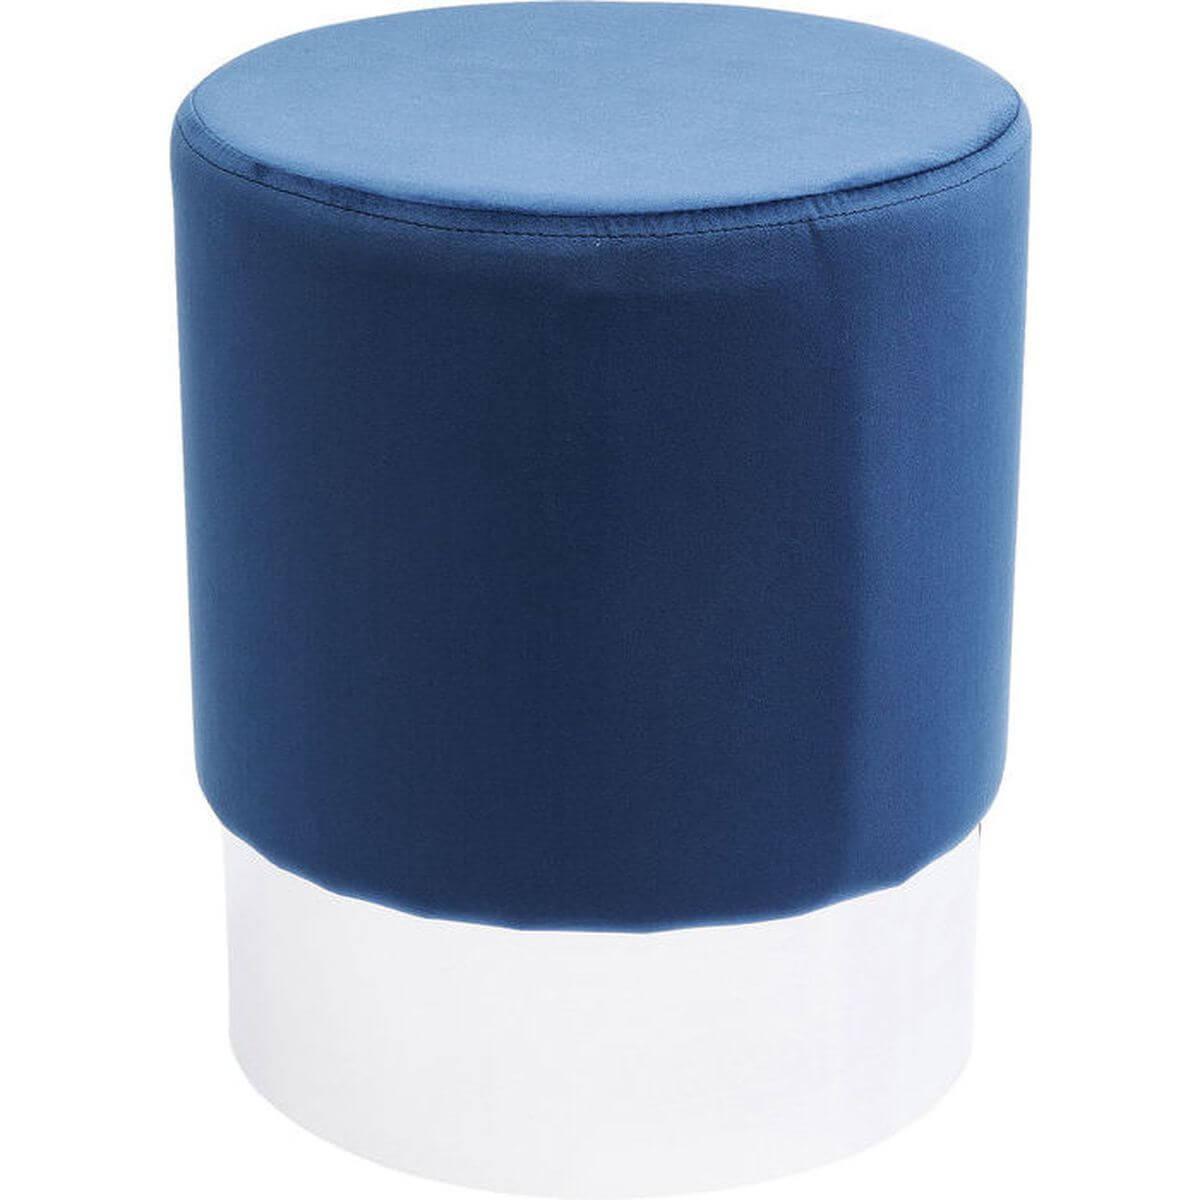 Tabouret CHERRY Kare Design bleu/argent 35cm